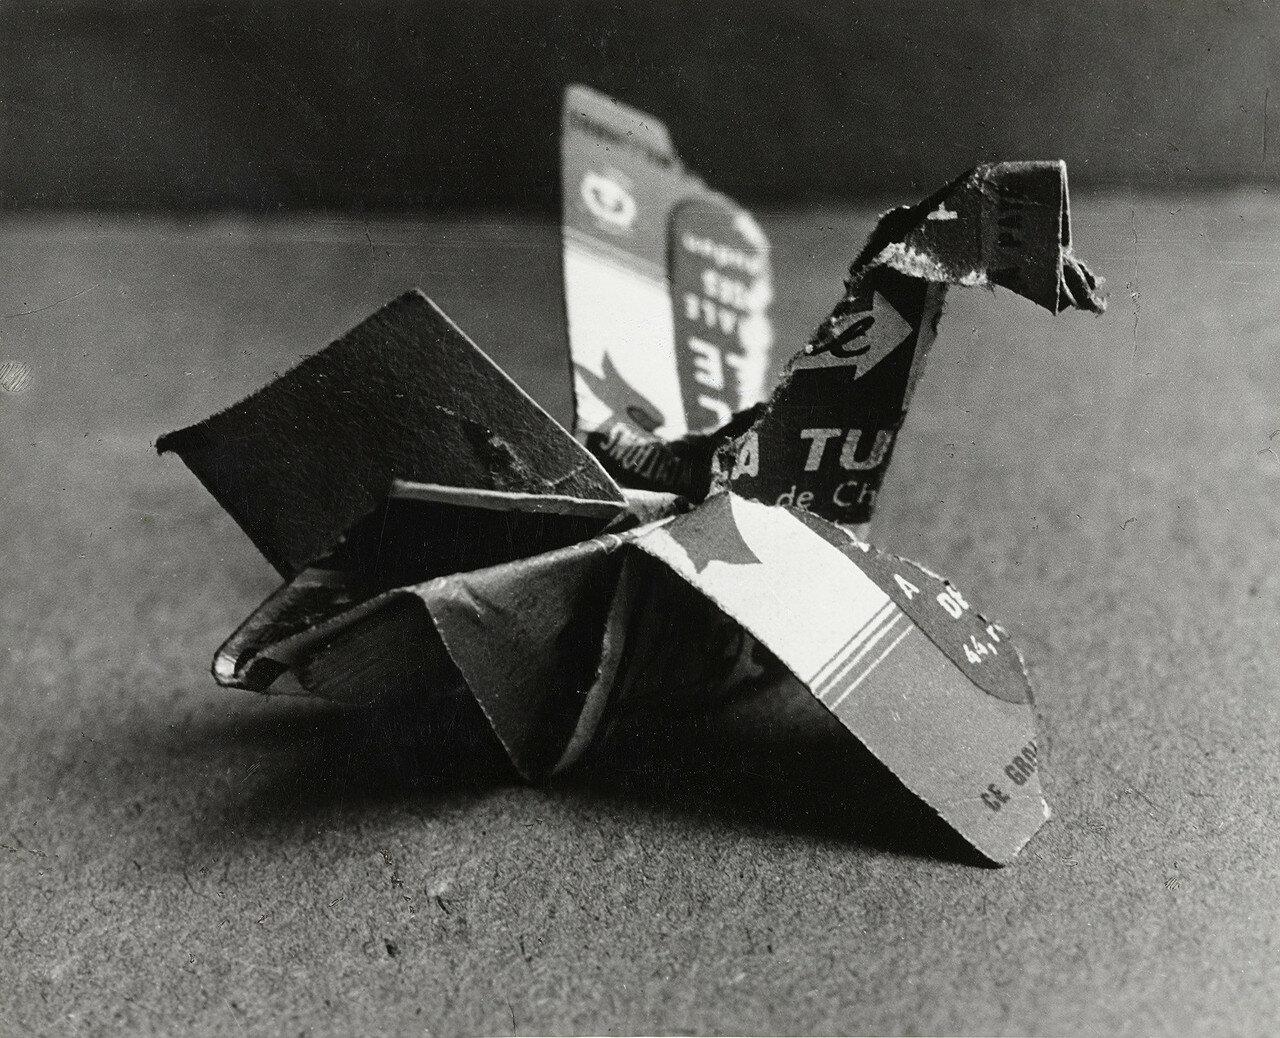 1943. Пикассо. Скульптура (спичечный коробок)